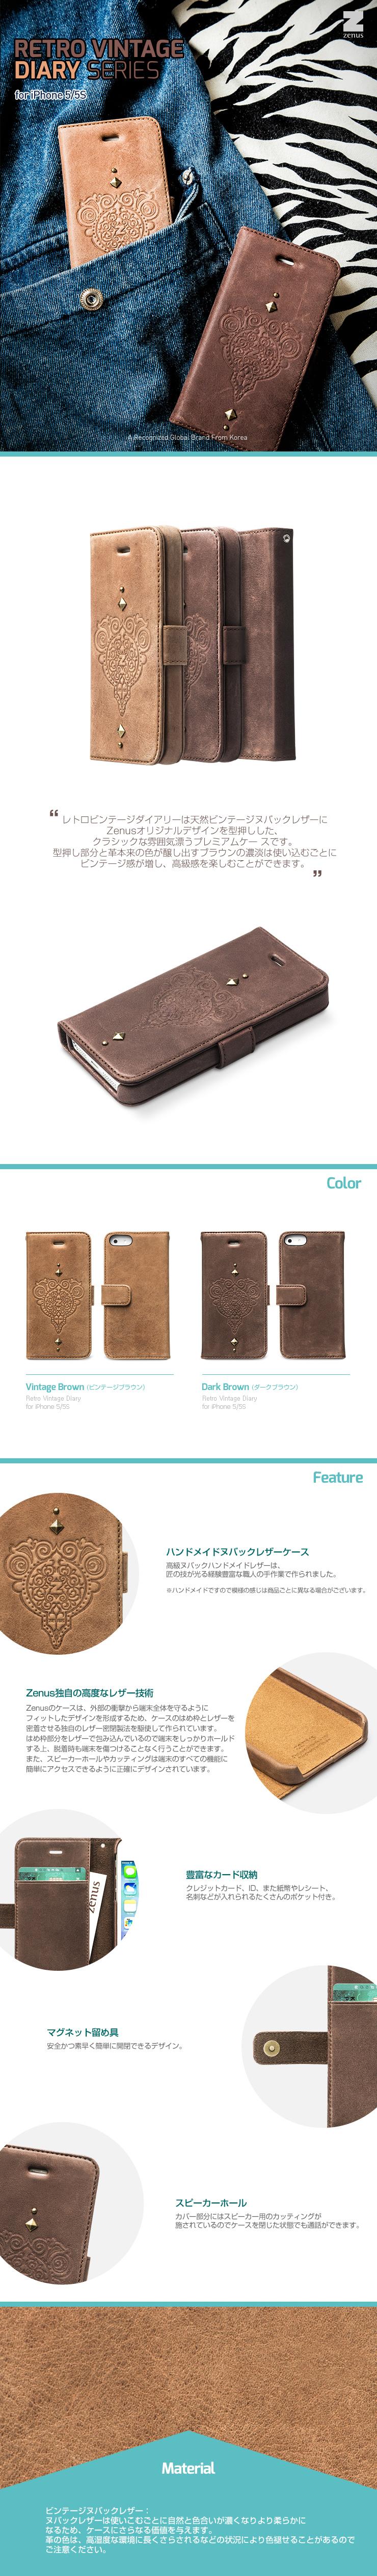 【iPhone5S/5】ZENUS Prestige Retro Vintage Diary (プレステージレトロビンテージダイアリー)